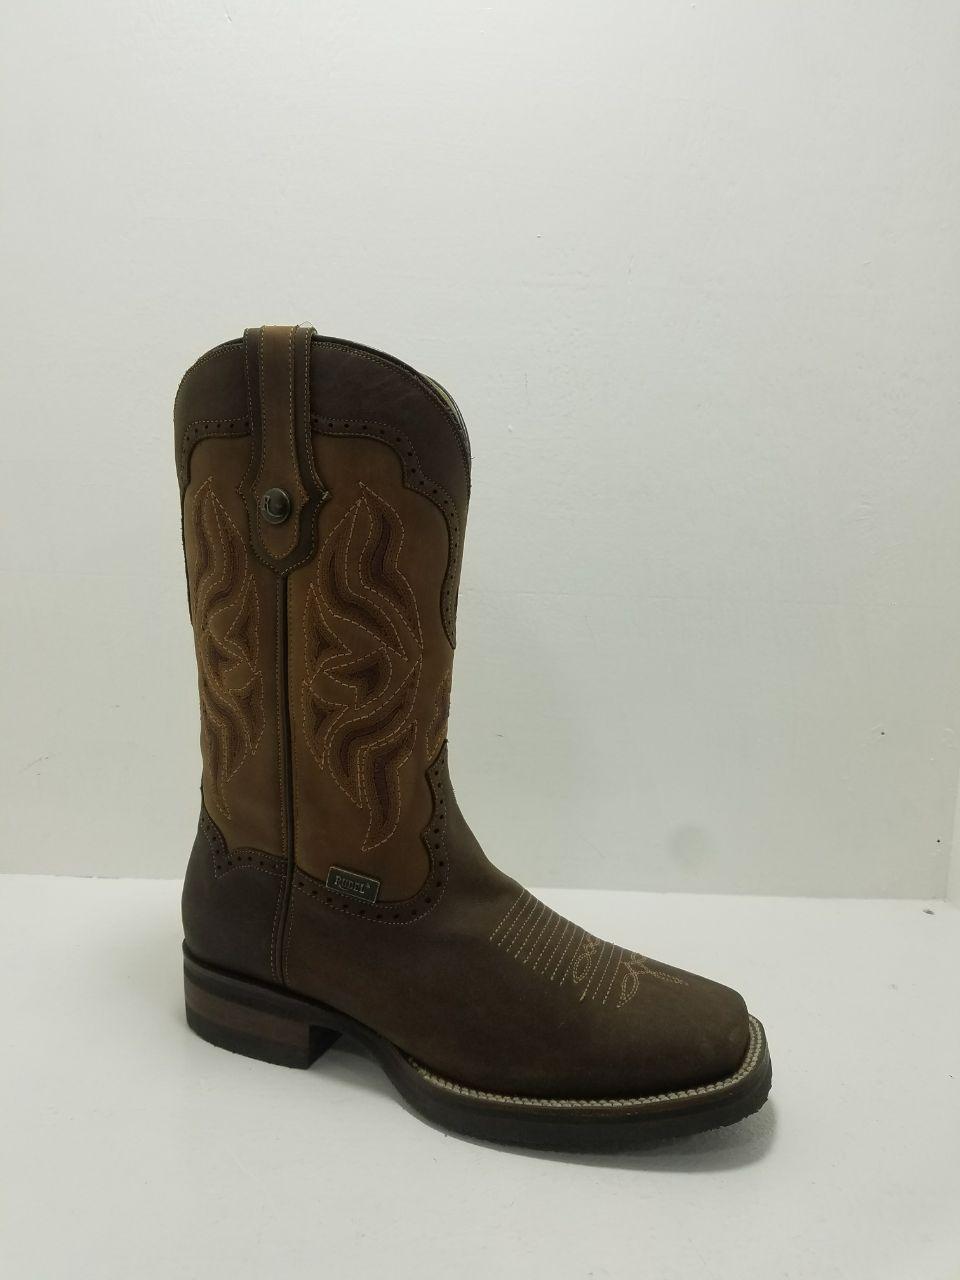 Rudel Mens Ranch Porto Chocolate Square Toe Cowboy Boots